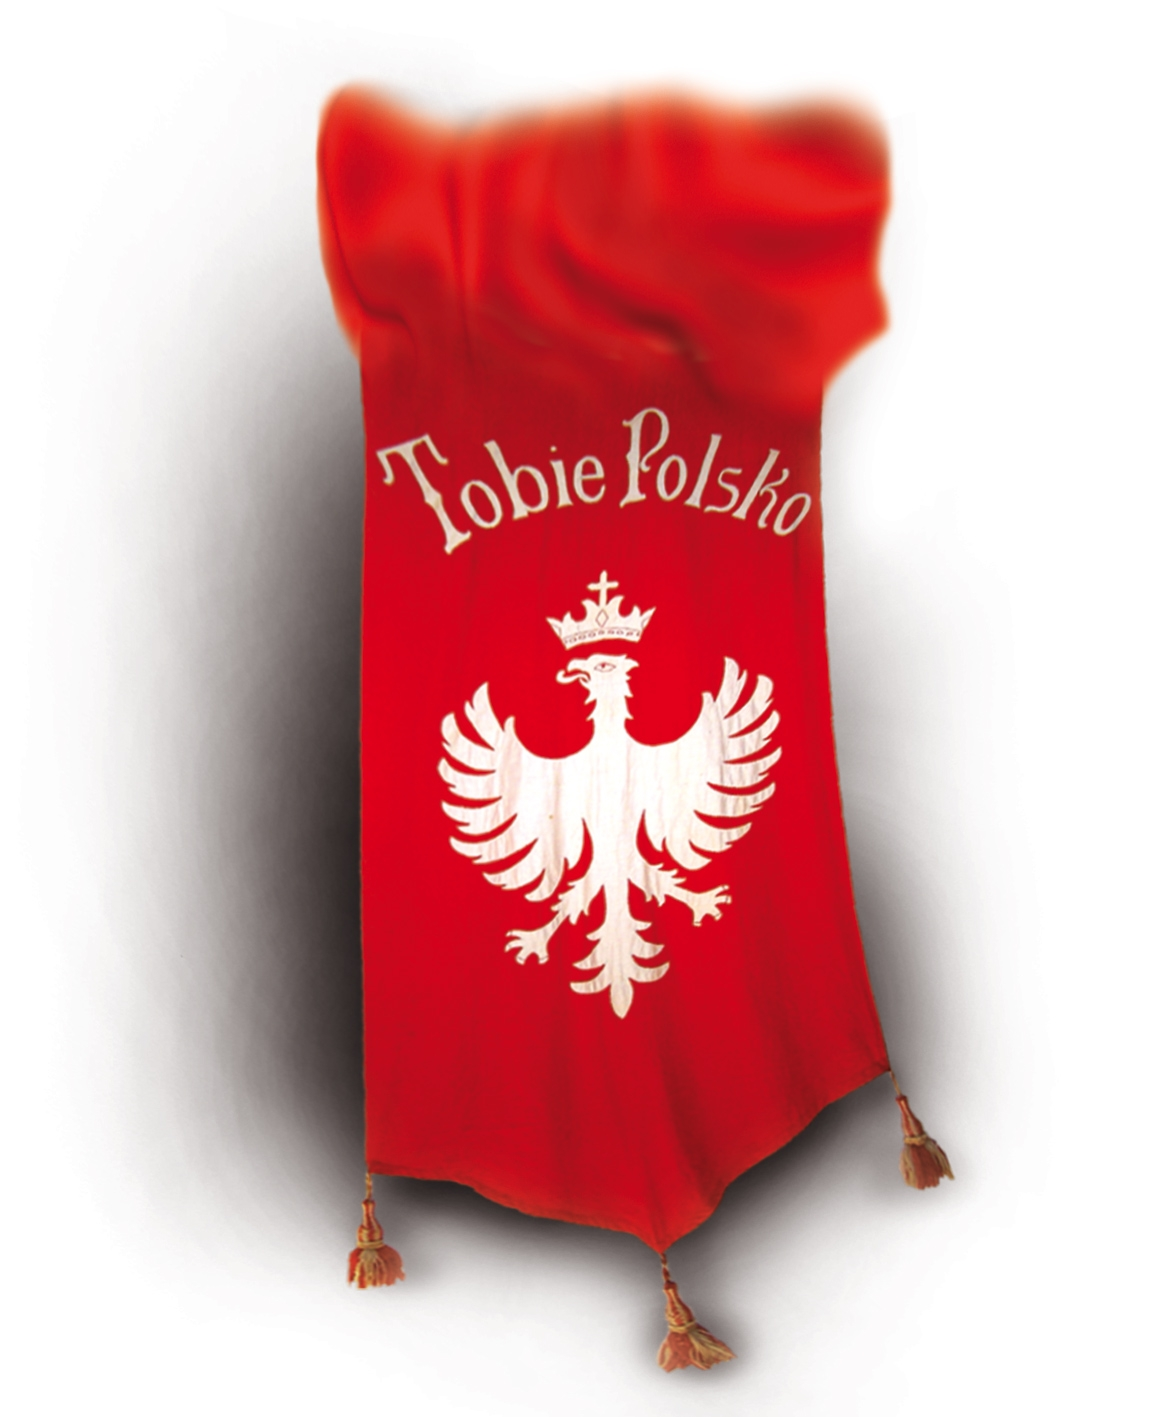 Tobie Polsko